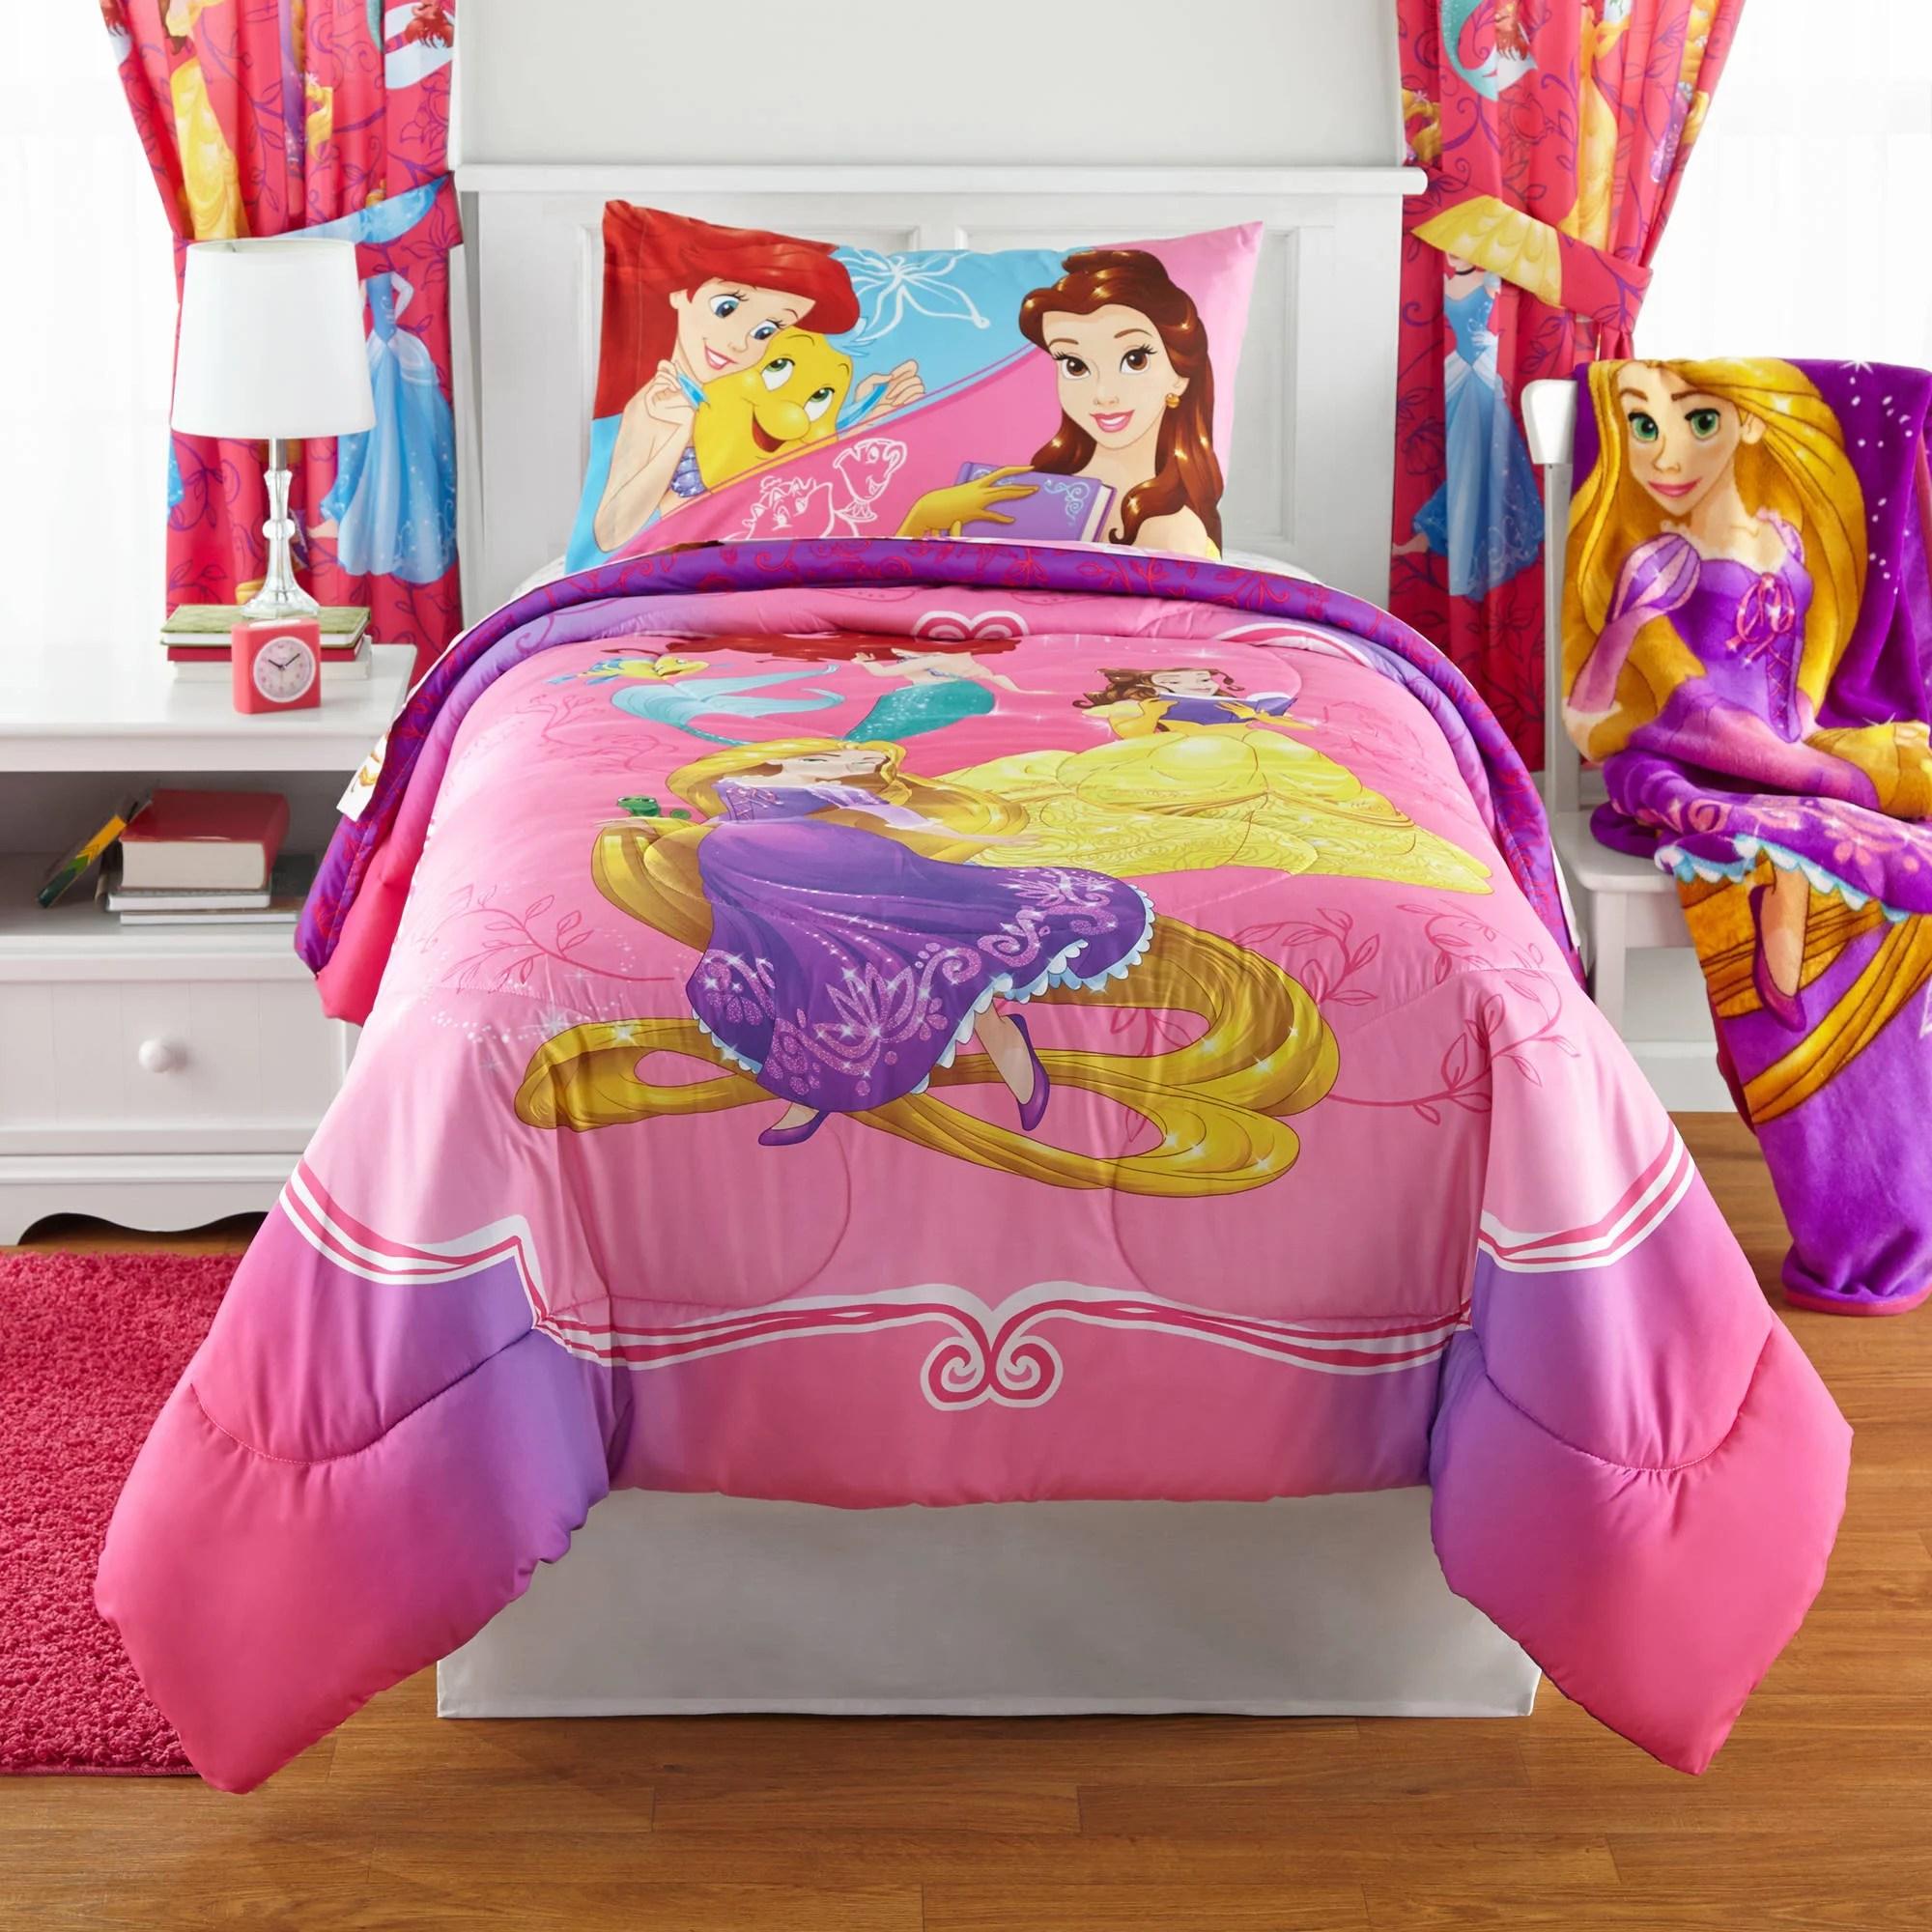 Disney Princess Bedazzling Princess Reversible Twin Full